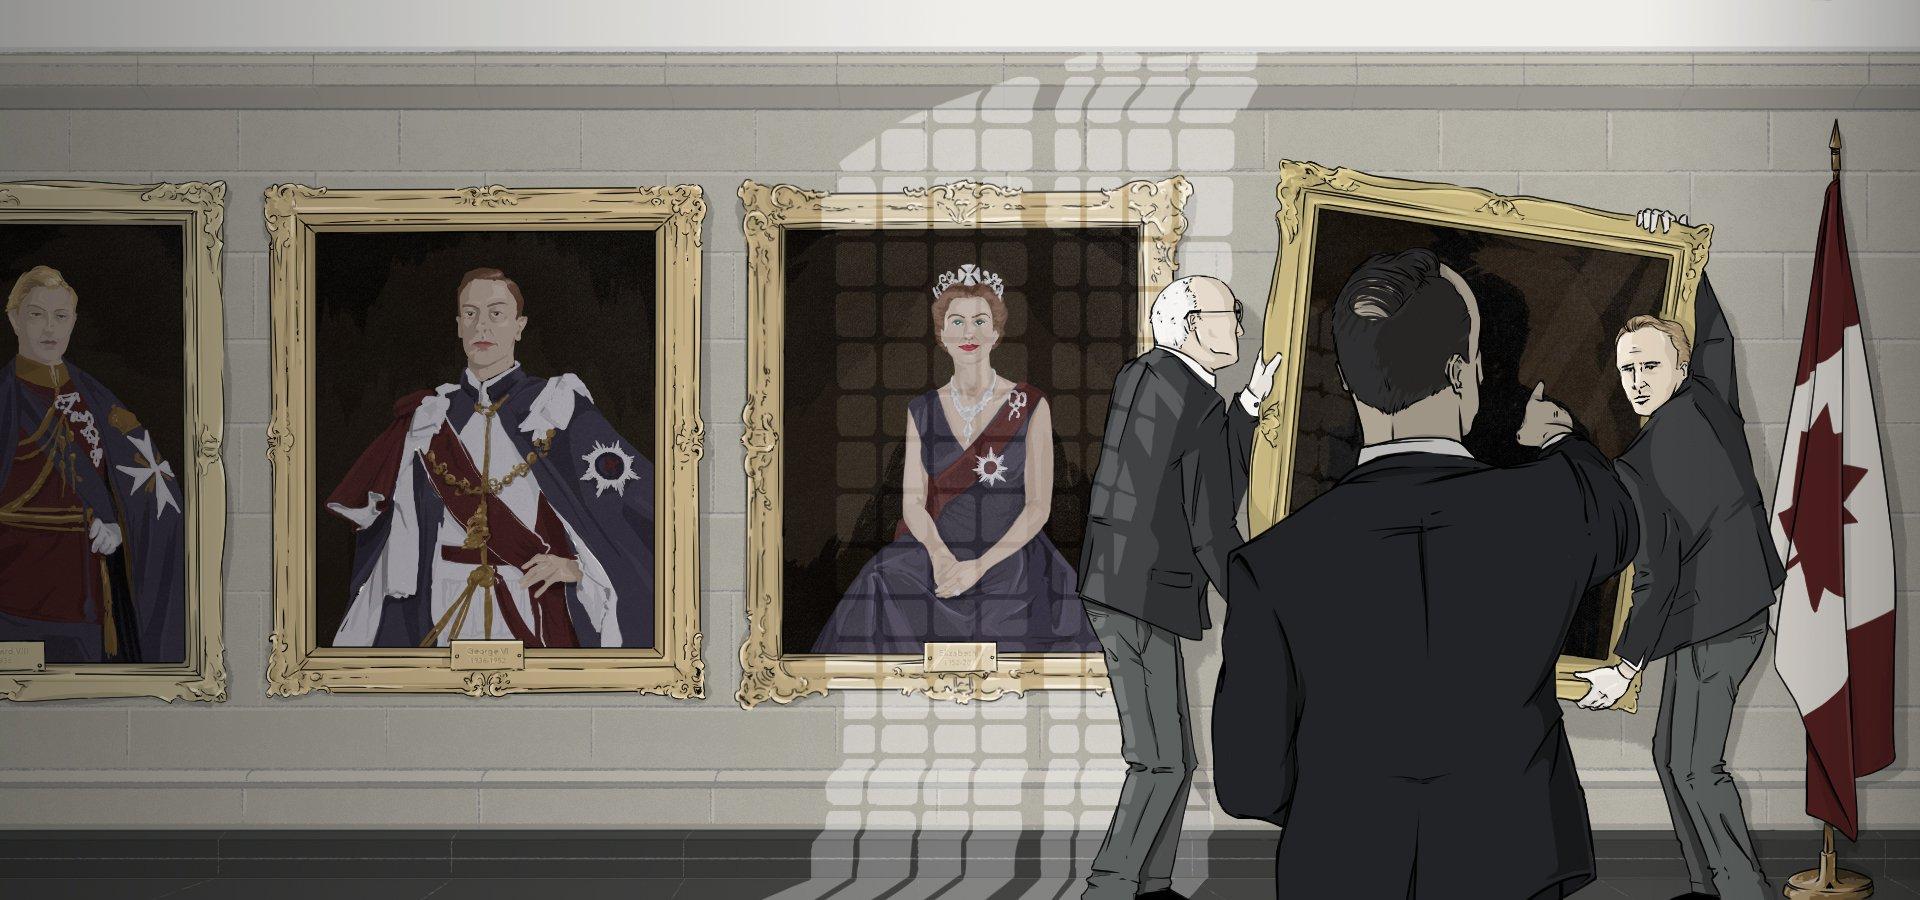 End of a royal era